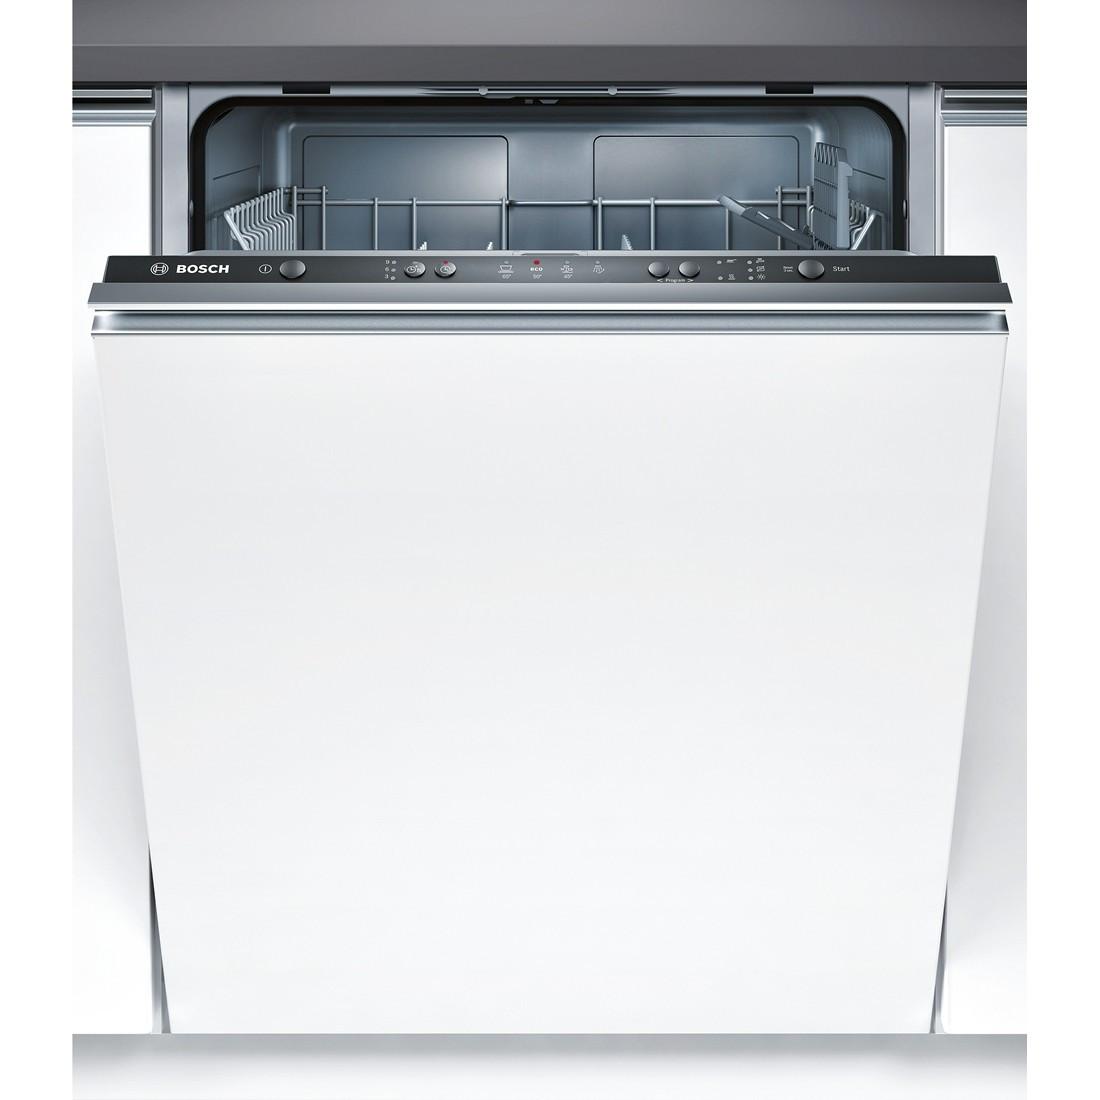 Bosch Serie 2 SMV40C30GB Integrated Dishwasher